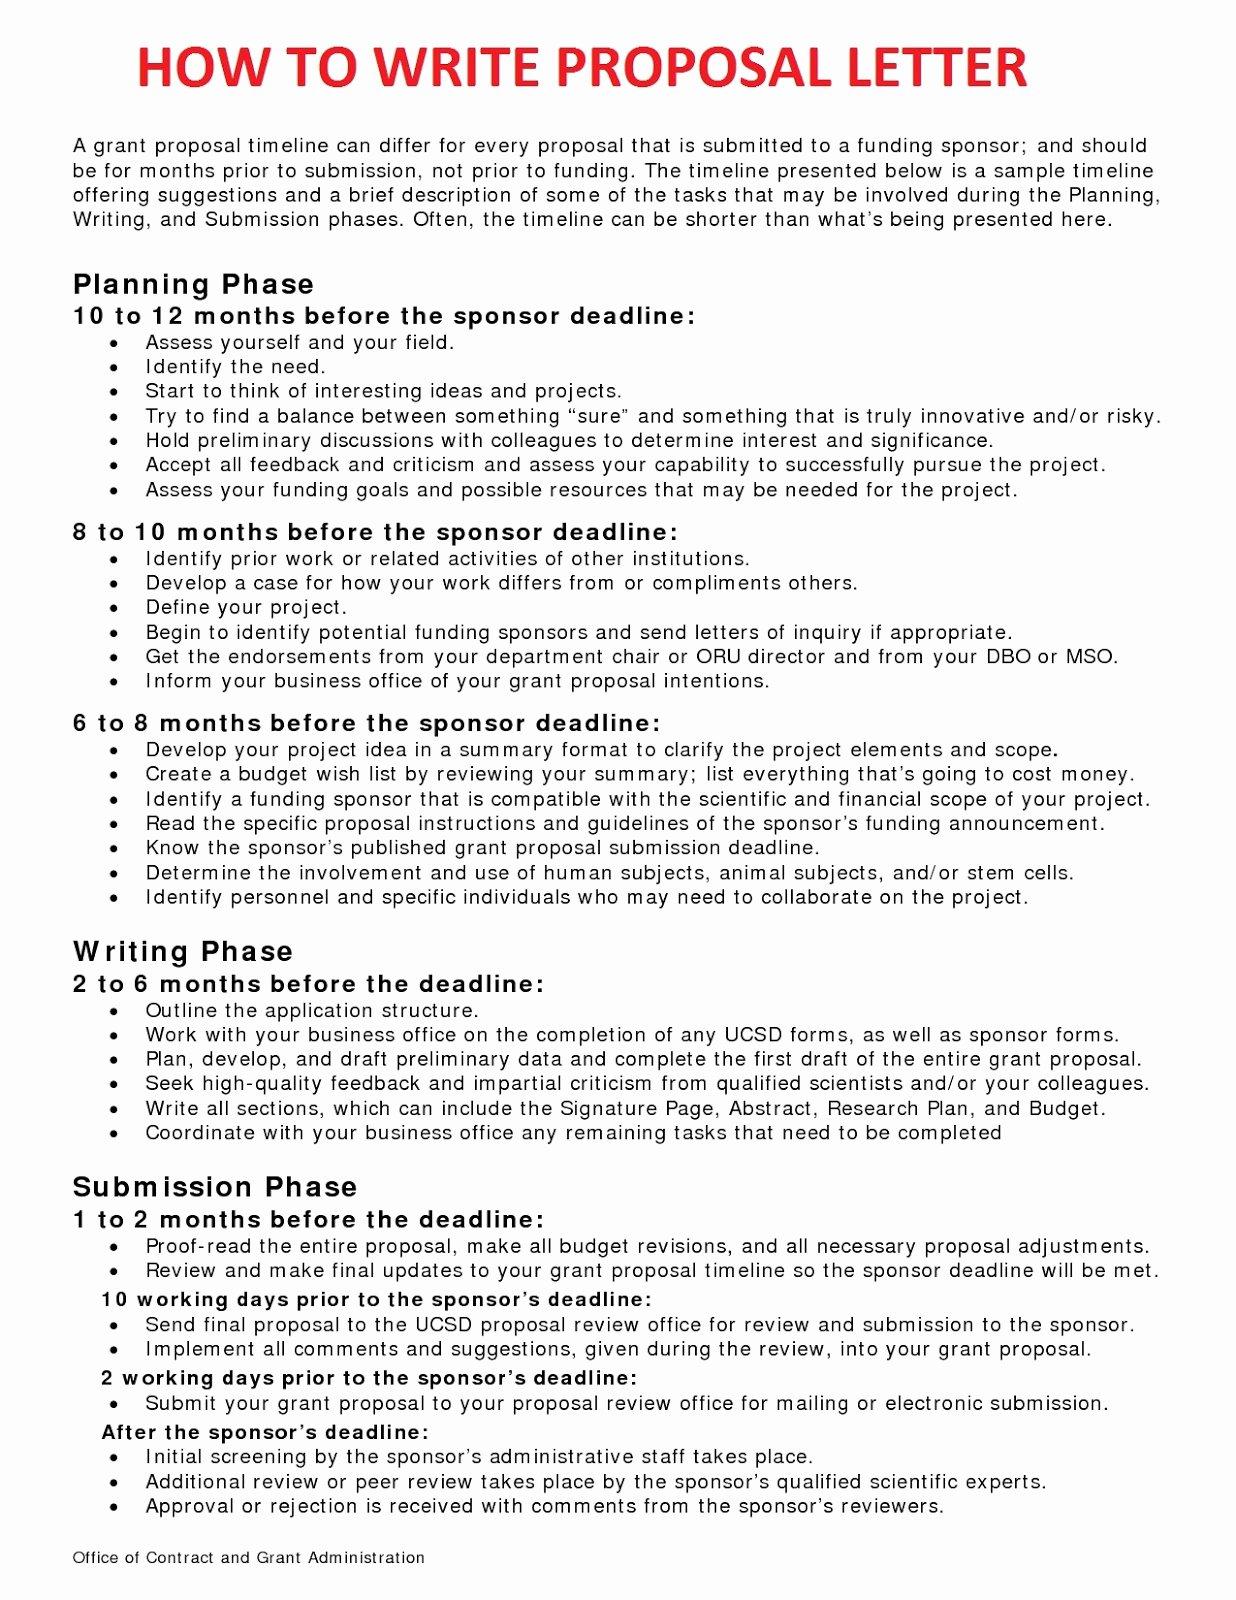 Written Proposal Examples Inspirational Business Letter Sample November 2012